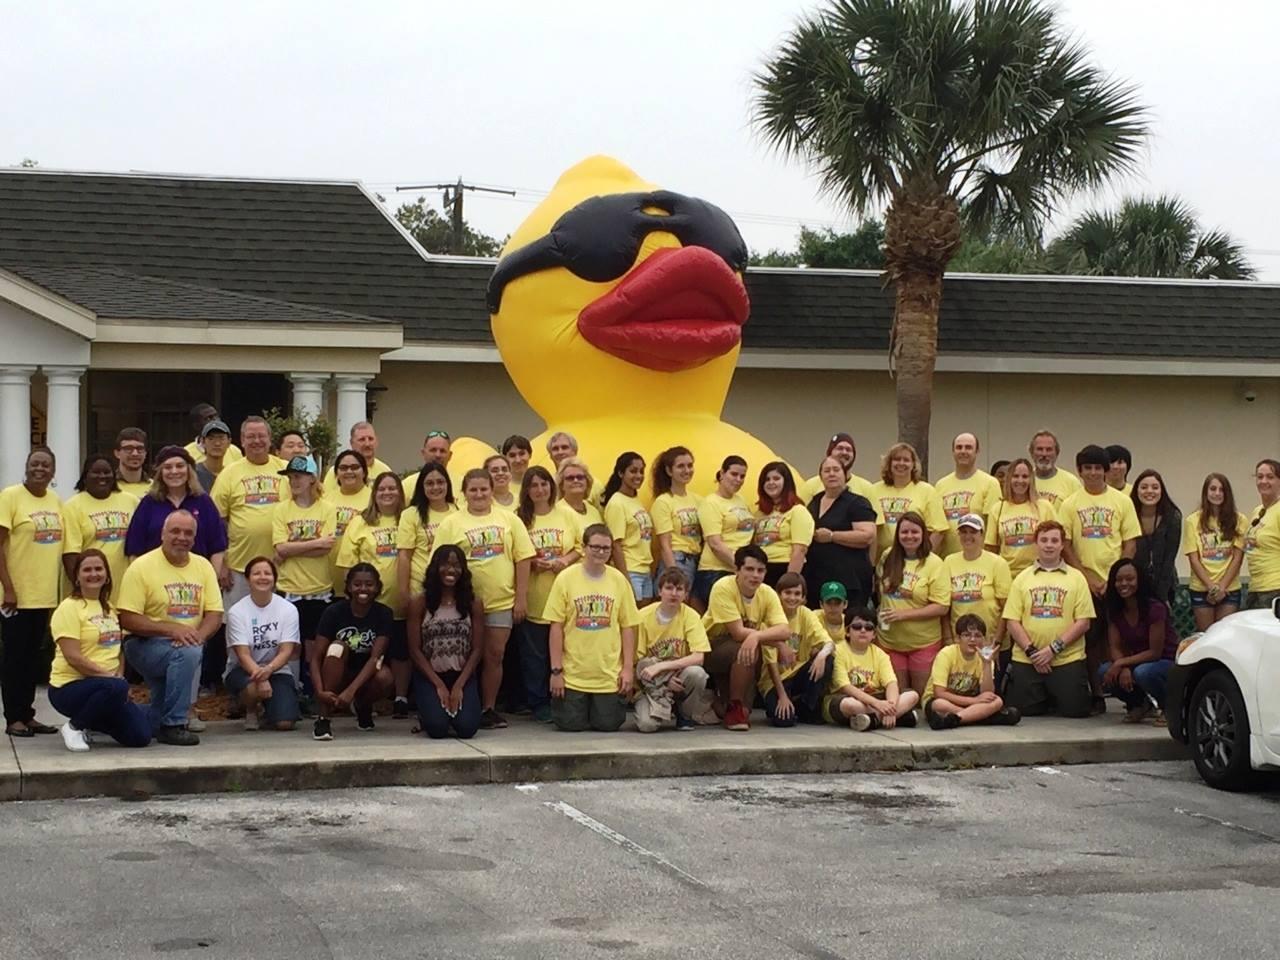 Crosswinds Youth Services in Brevard, FL